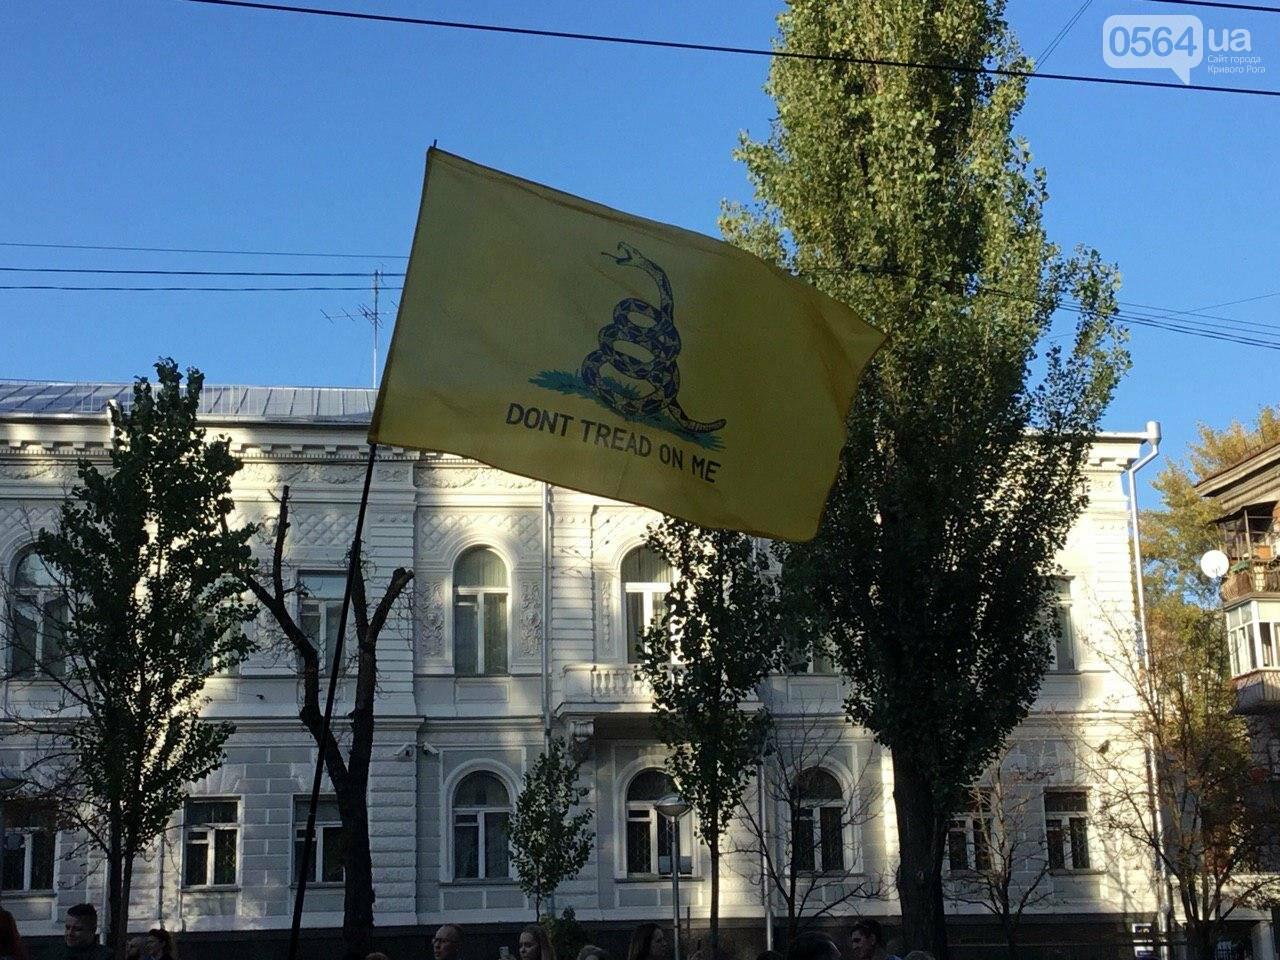 Криворожане поддержали Марш сопротивления капитуляции в Киеве, - ФОТО, ВИДЕО, ОБНОВЛЕНО, фото-18